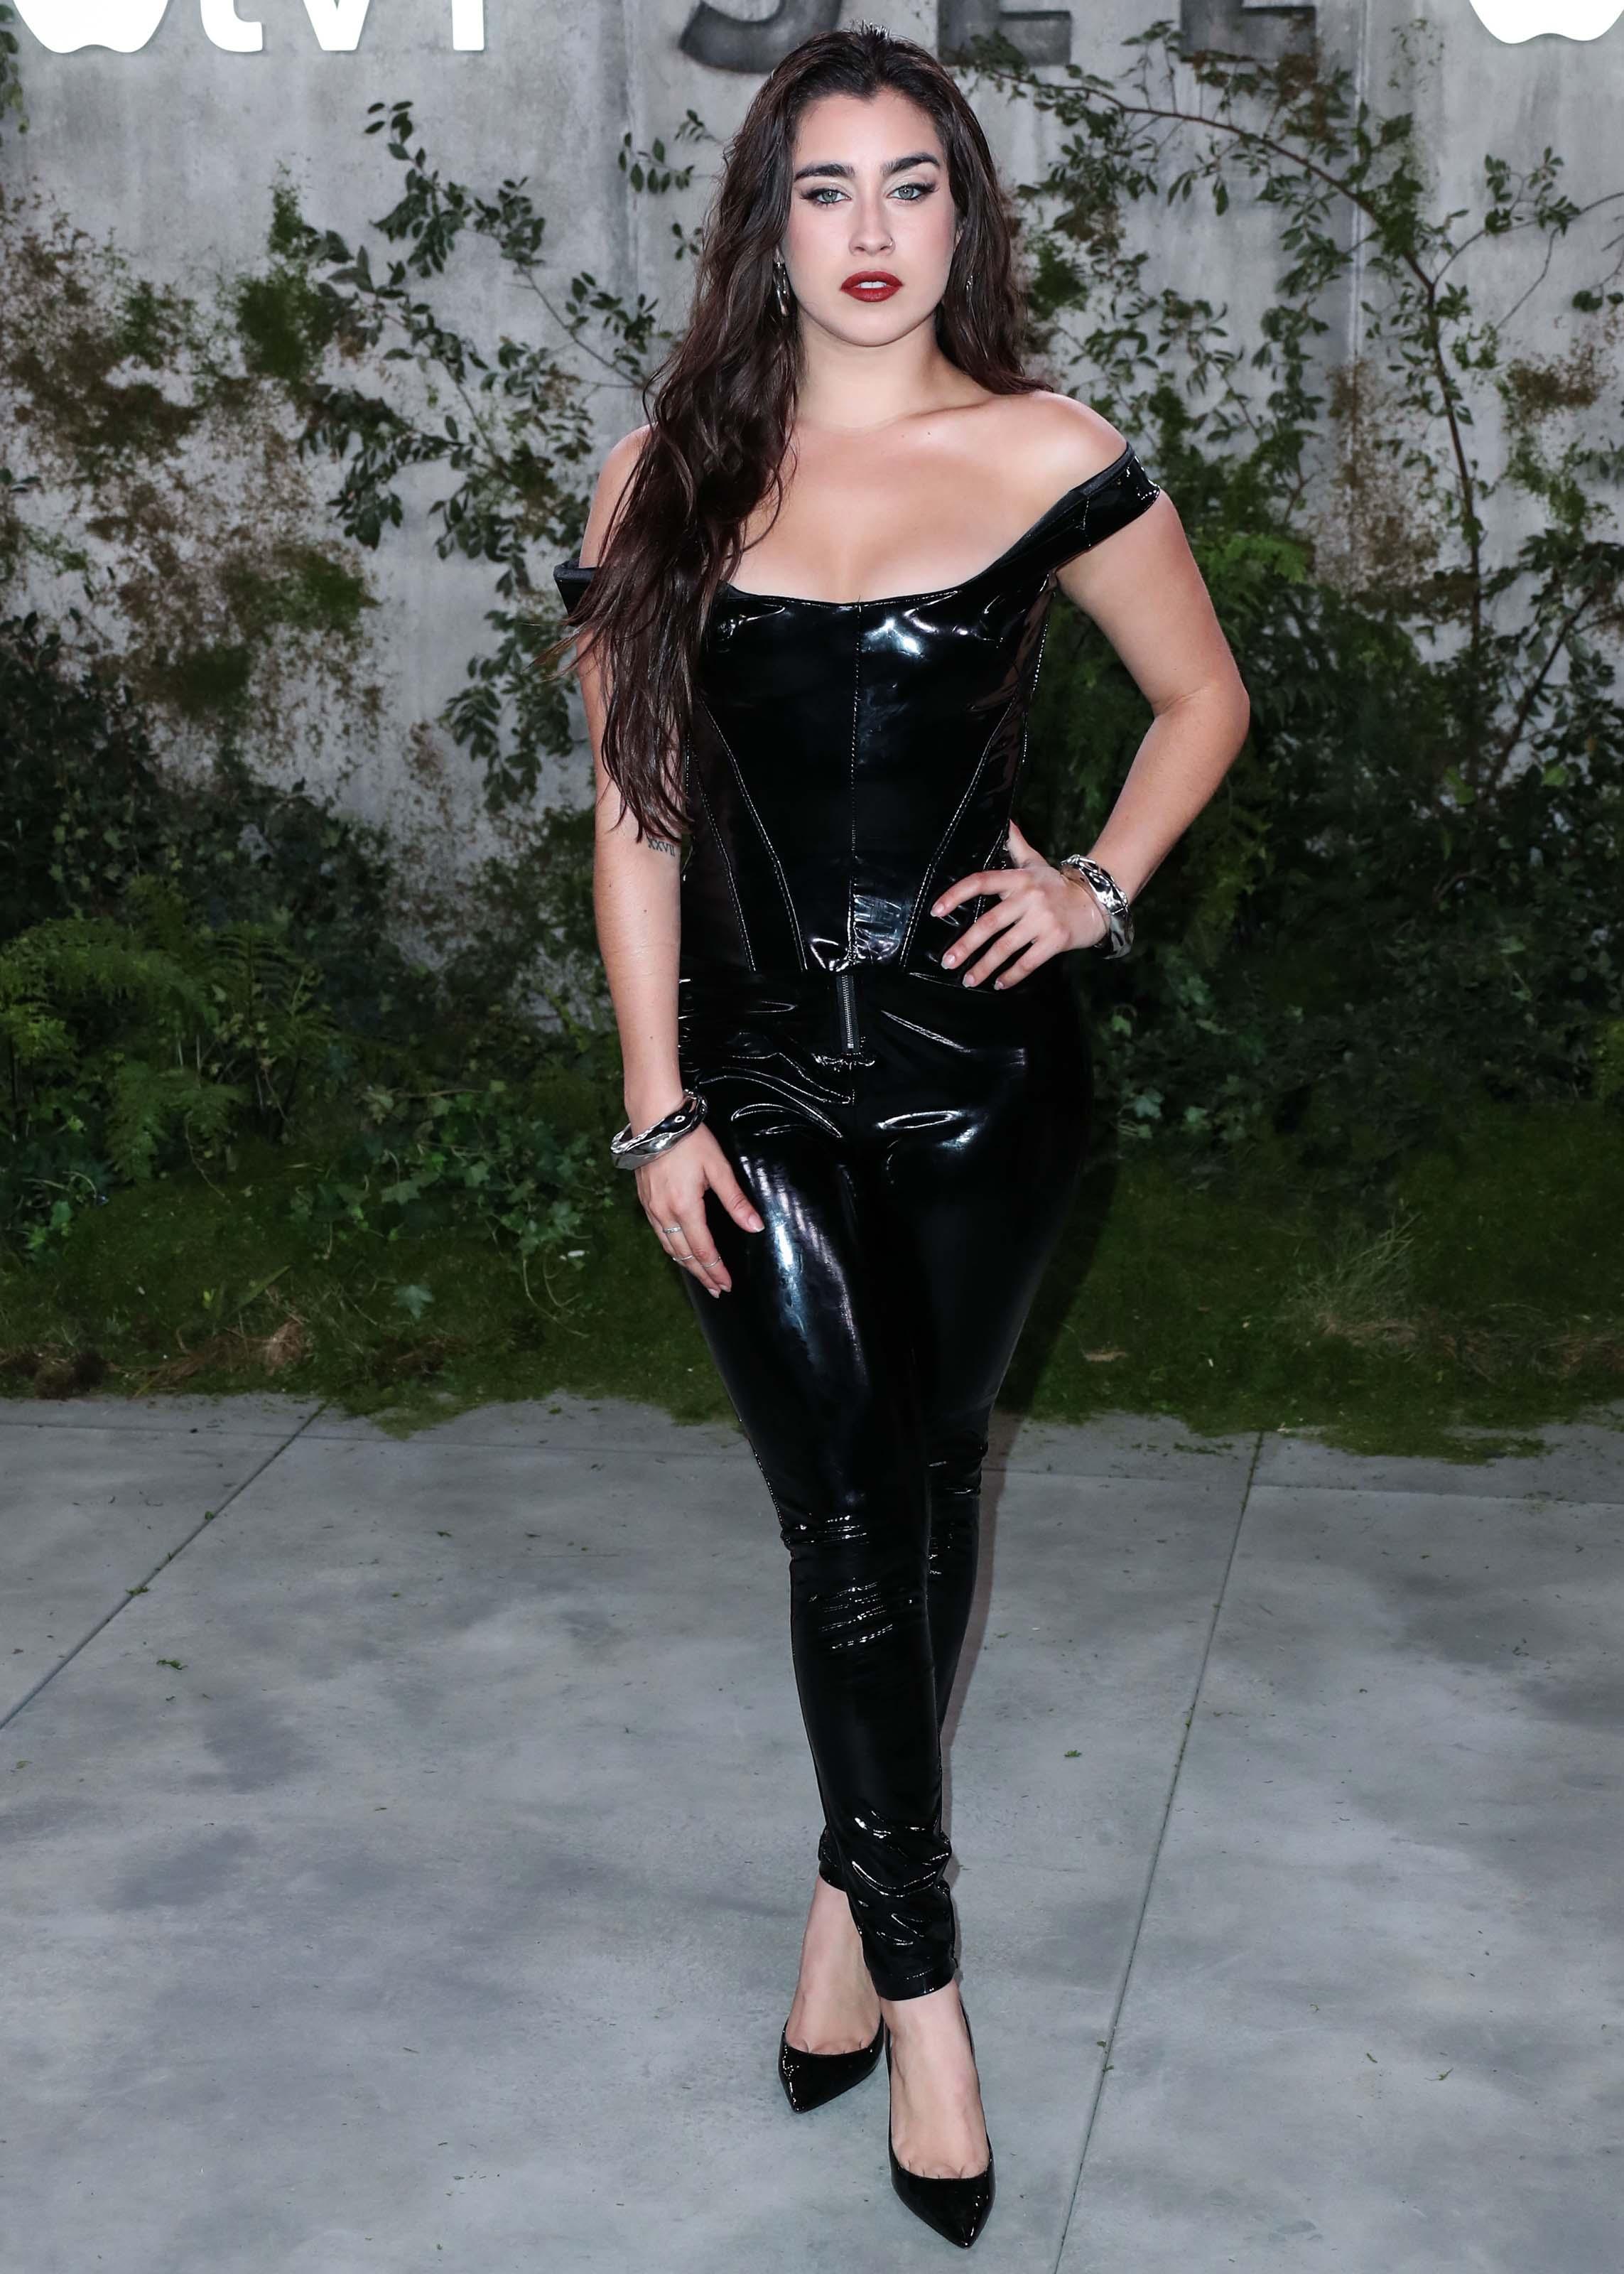 Lauren Jauregui attends See TV show premiere